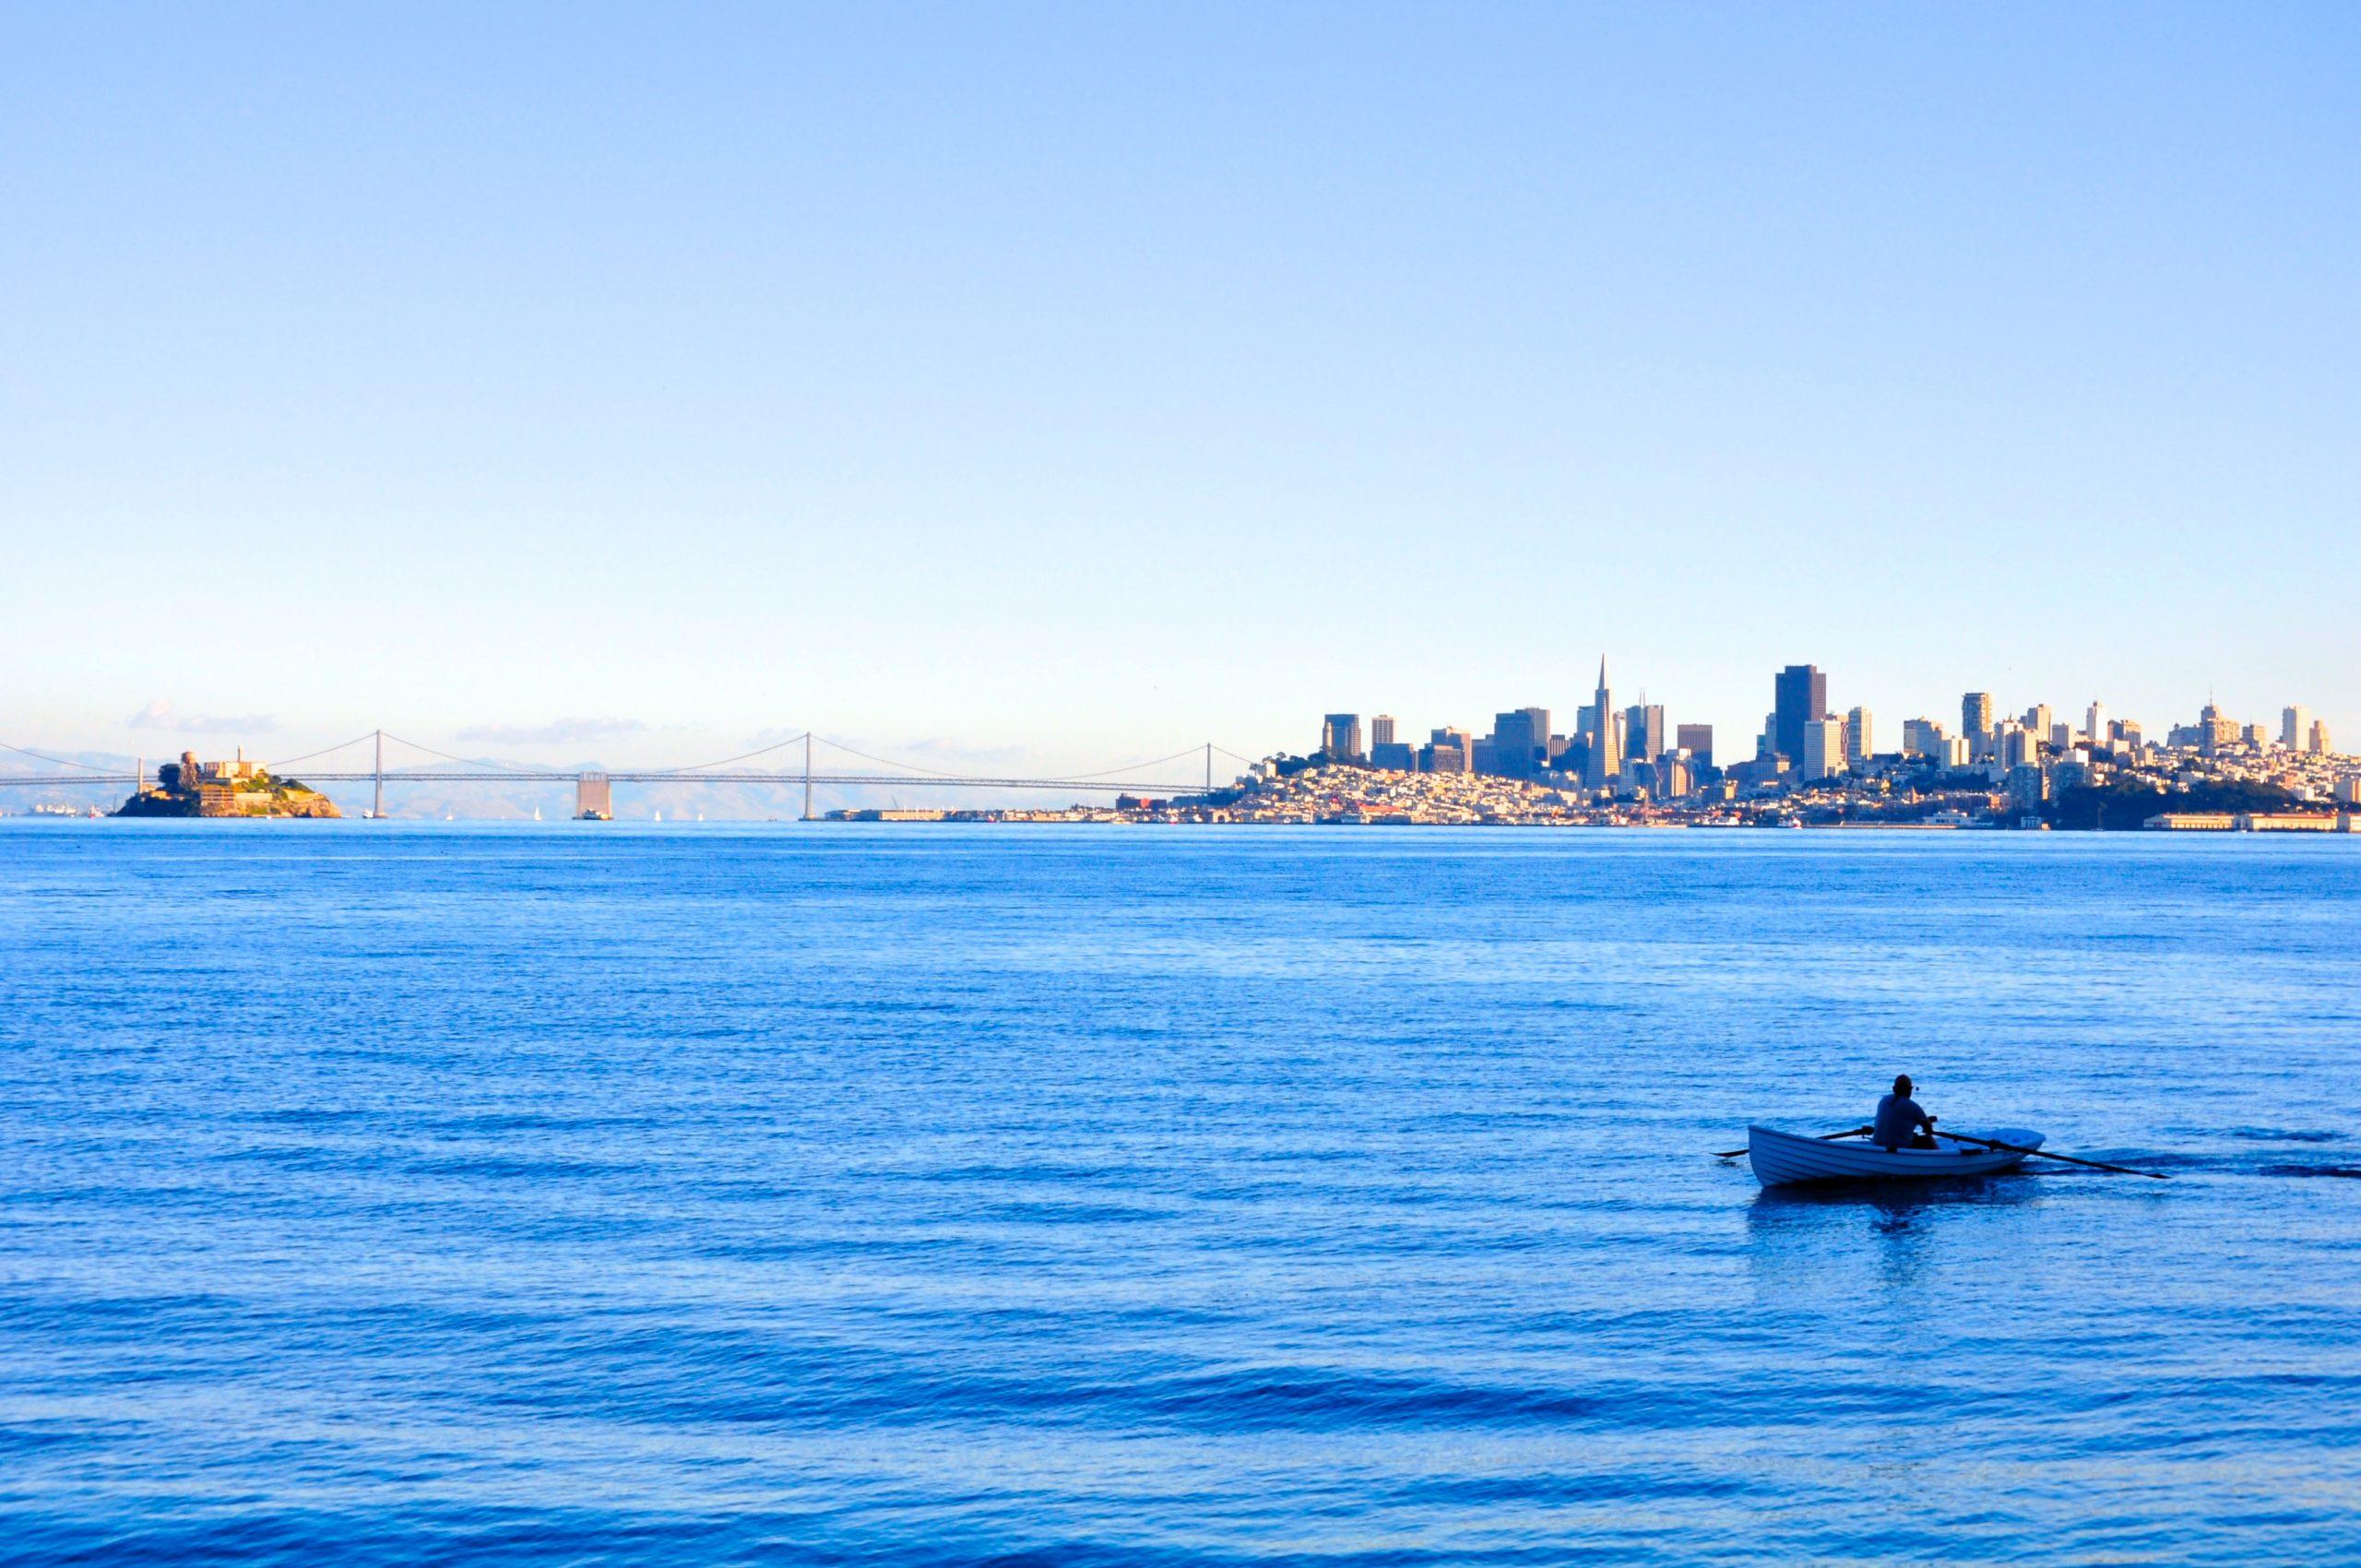 San Francisco Bay with skyline and Bay Bridge view